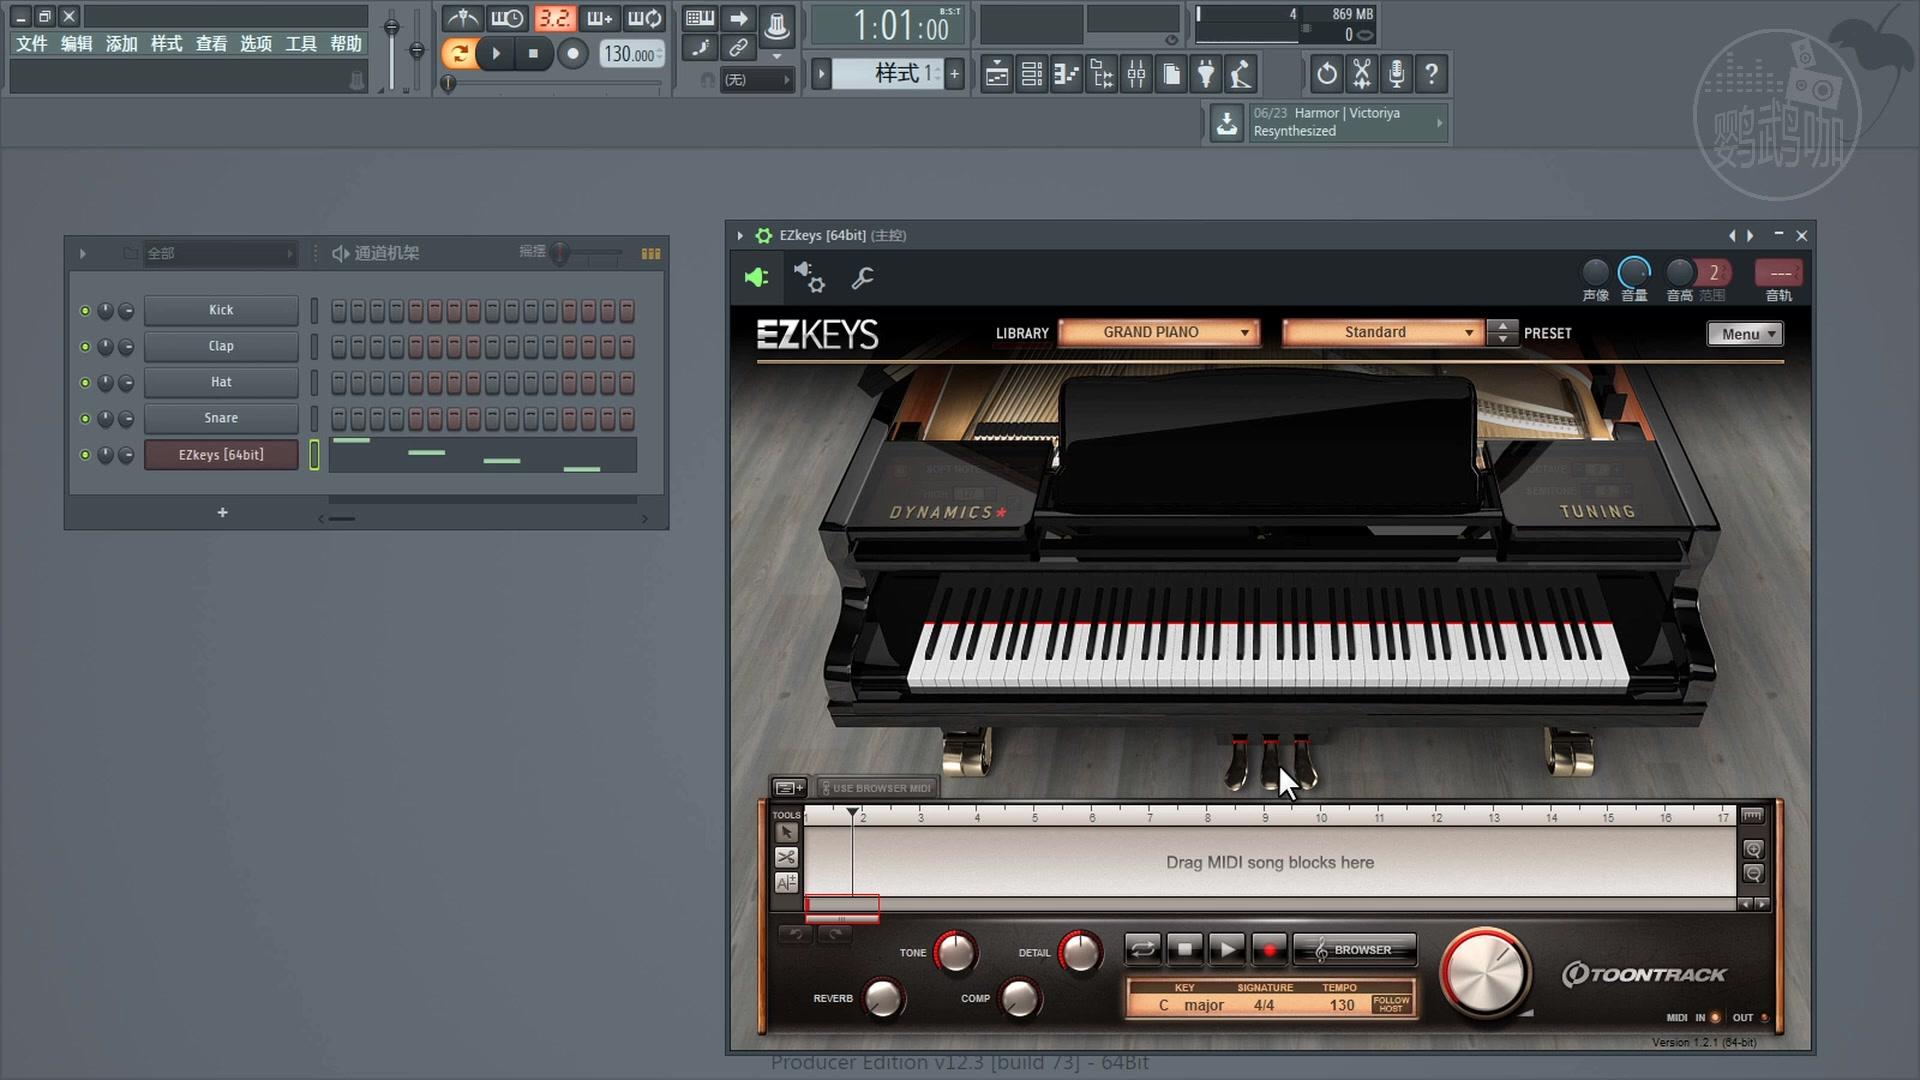 FL Studio12電音編輯軟件水果教程61 延音踏板在哪里_嗶哩嗶哩 (゜-゜)つロ 干杯~-bilibili